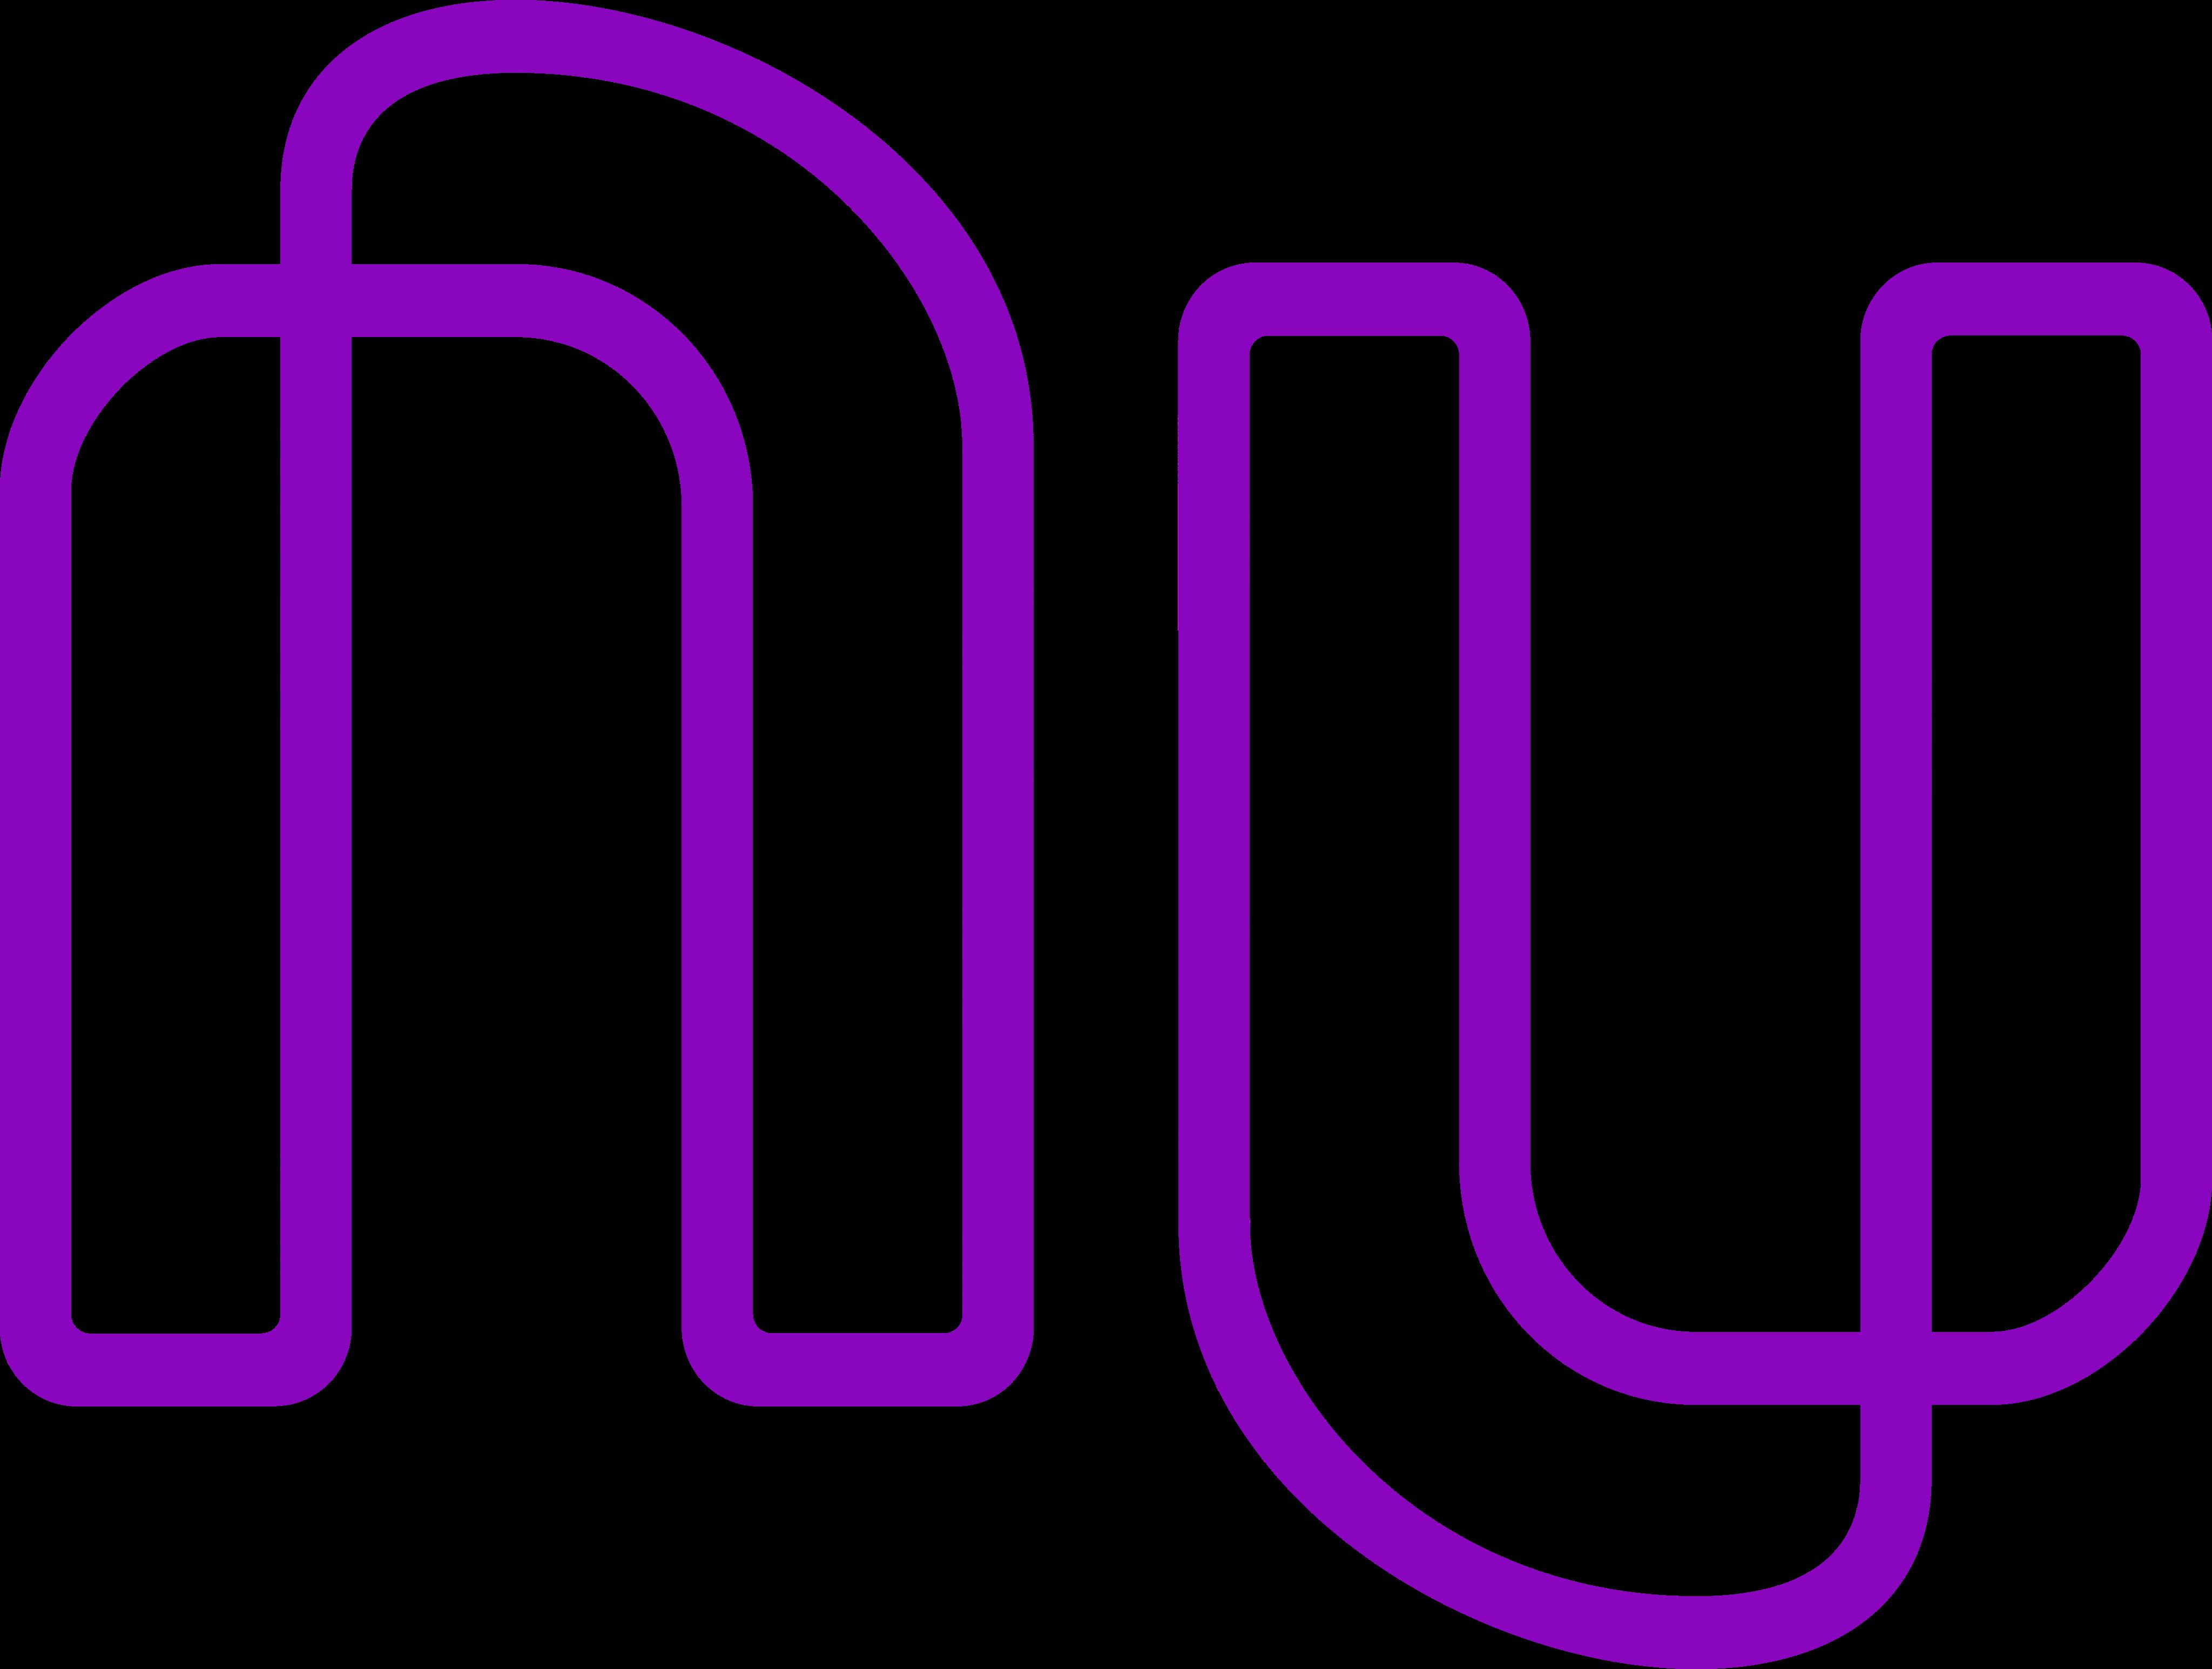 nubank logo 3 - Nubank Logo